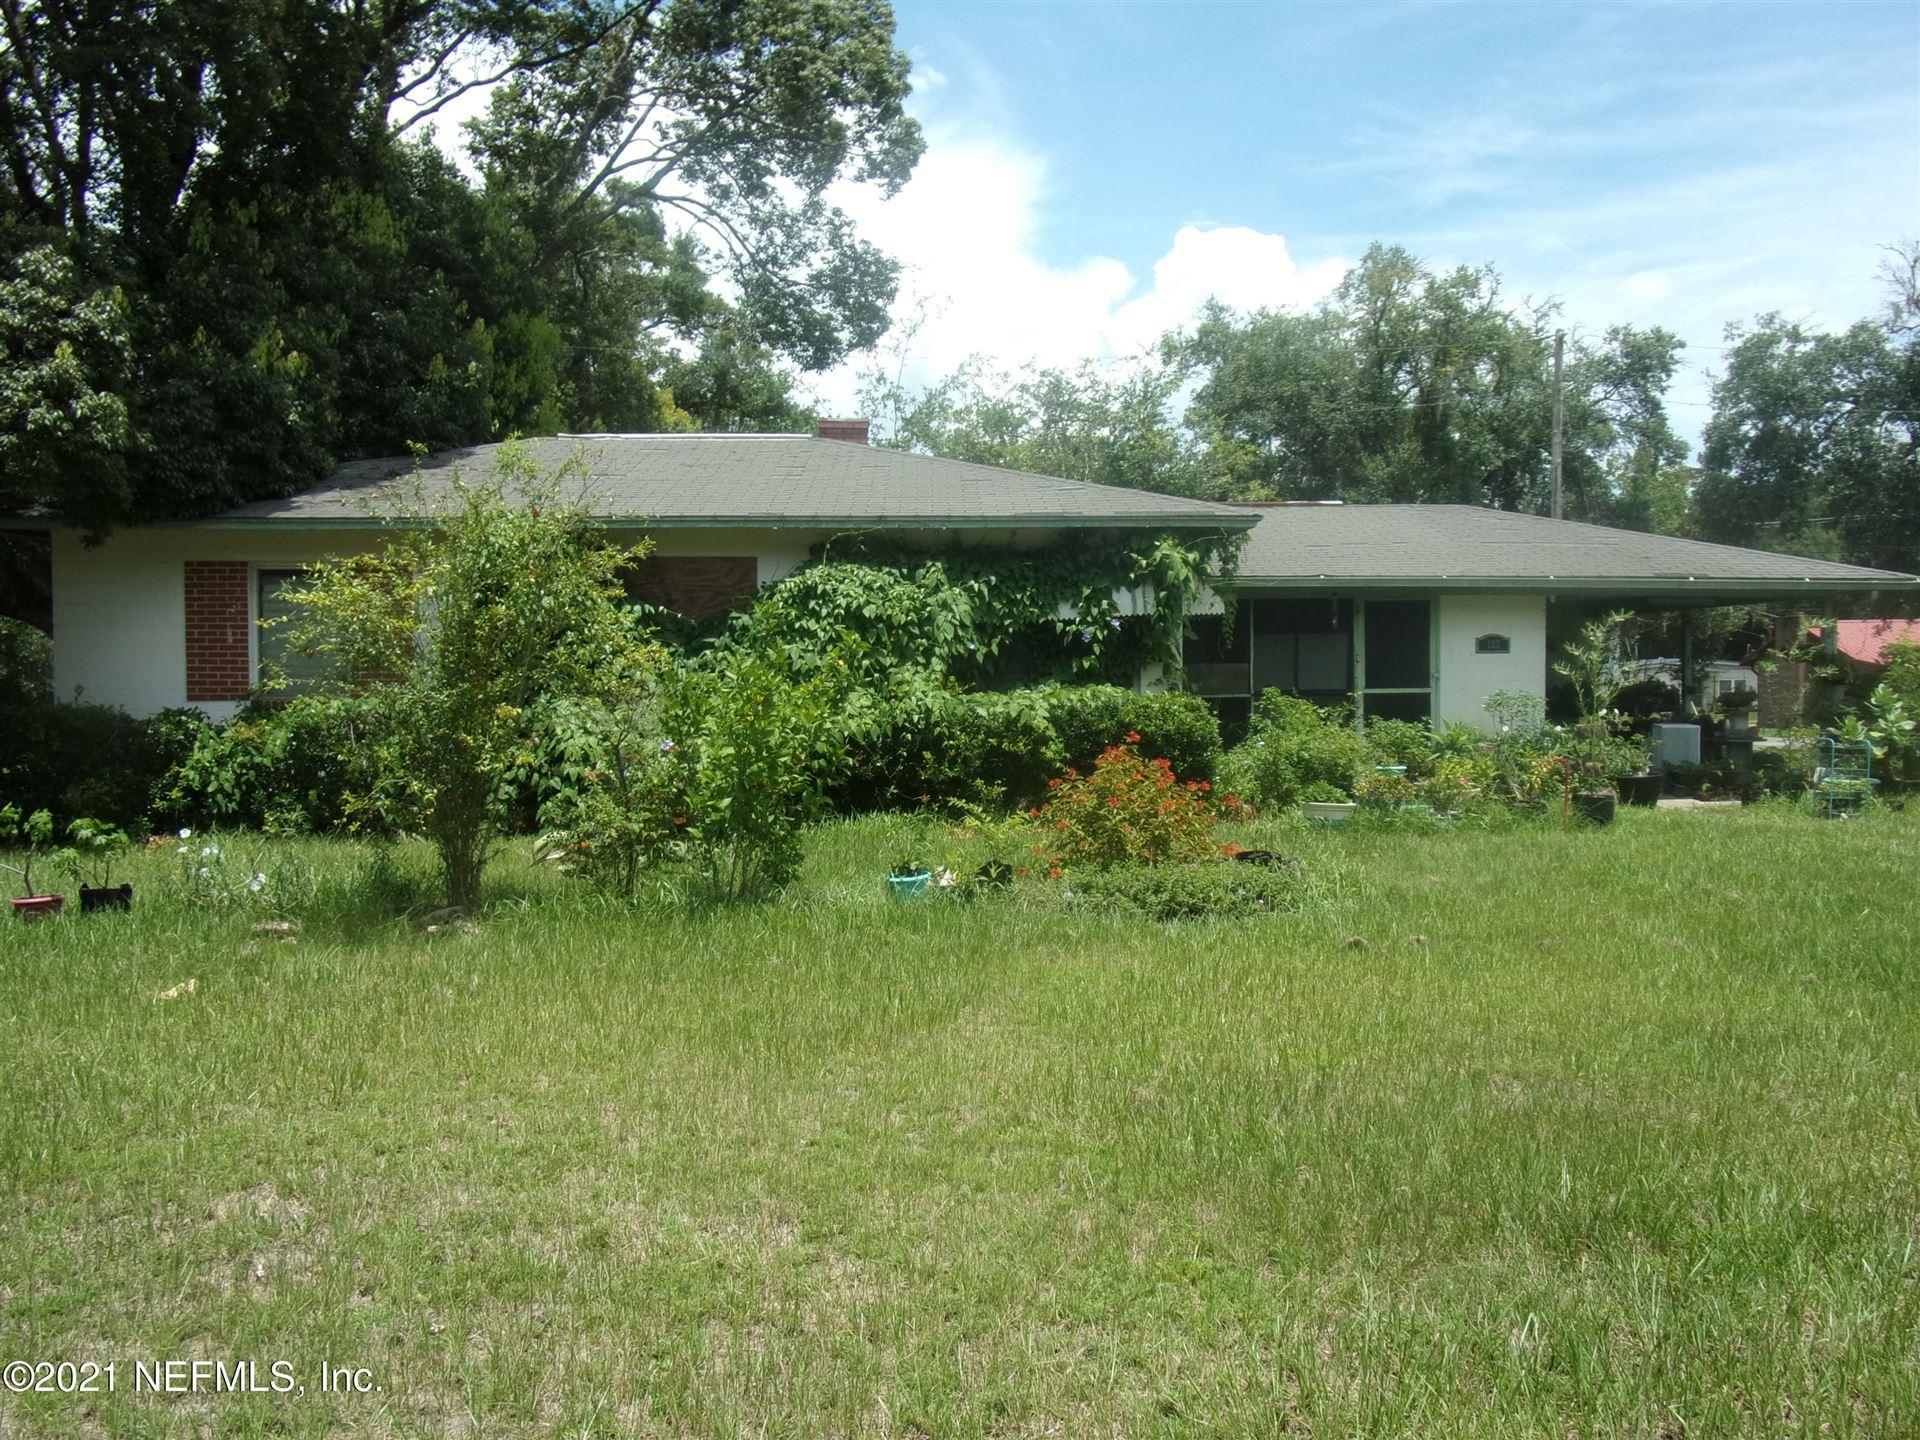 102 FERNWOOD ST #Unit No: 8450 Lot No, Palatka, FL 32177 - MLS#: 1115283